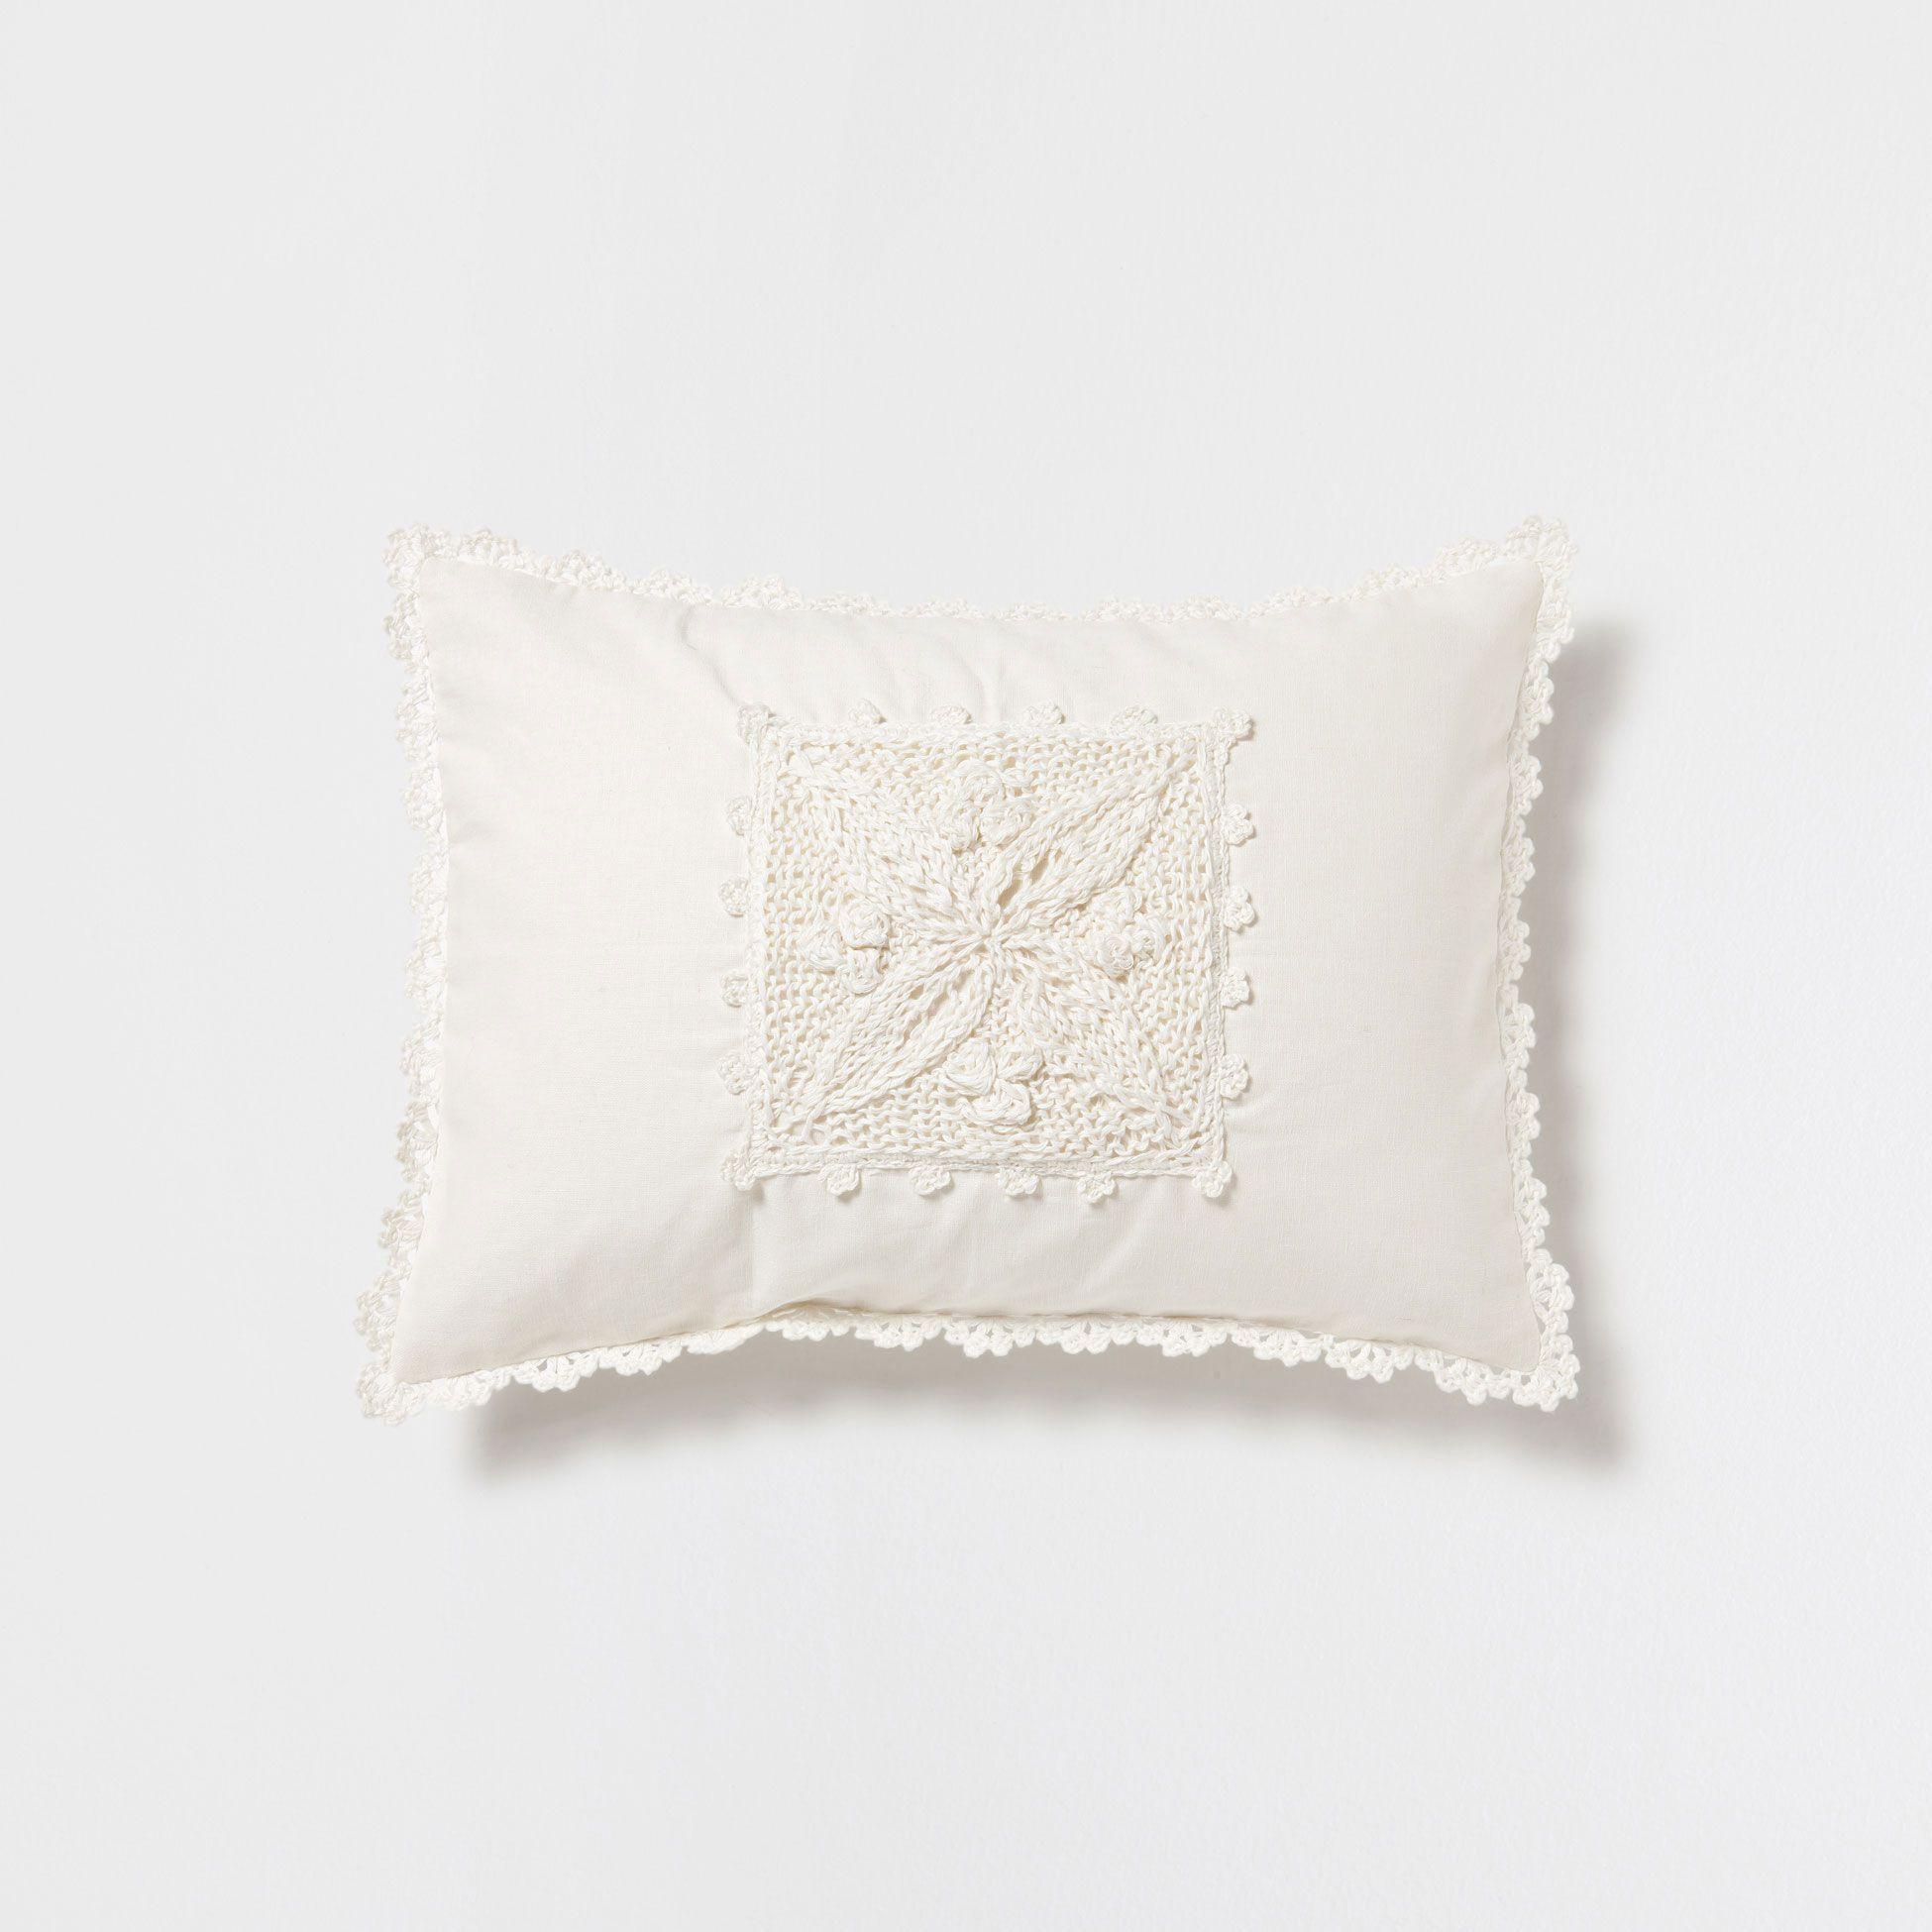 Linen And Crochet Pillow Decorative Pillows Bedroom Zara Home United States Kirlent Yastiklar